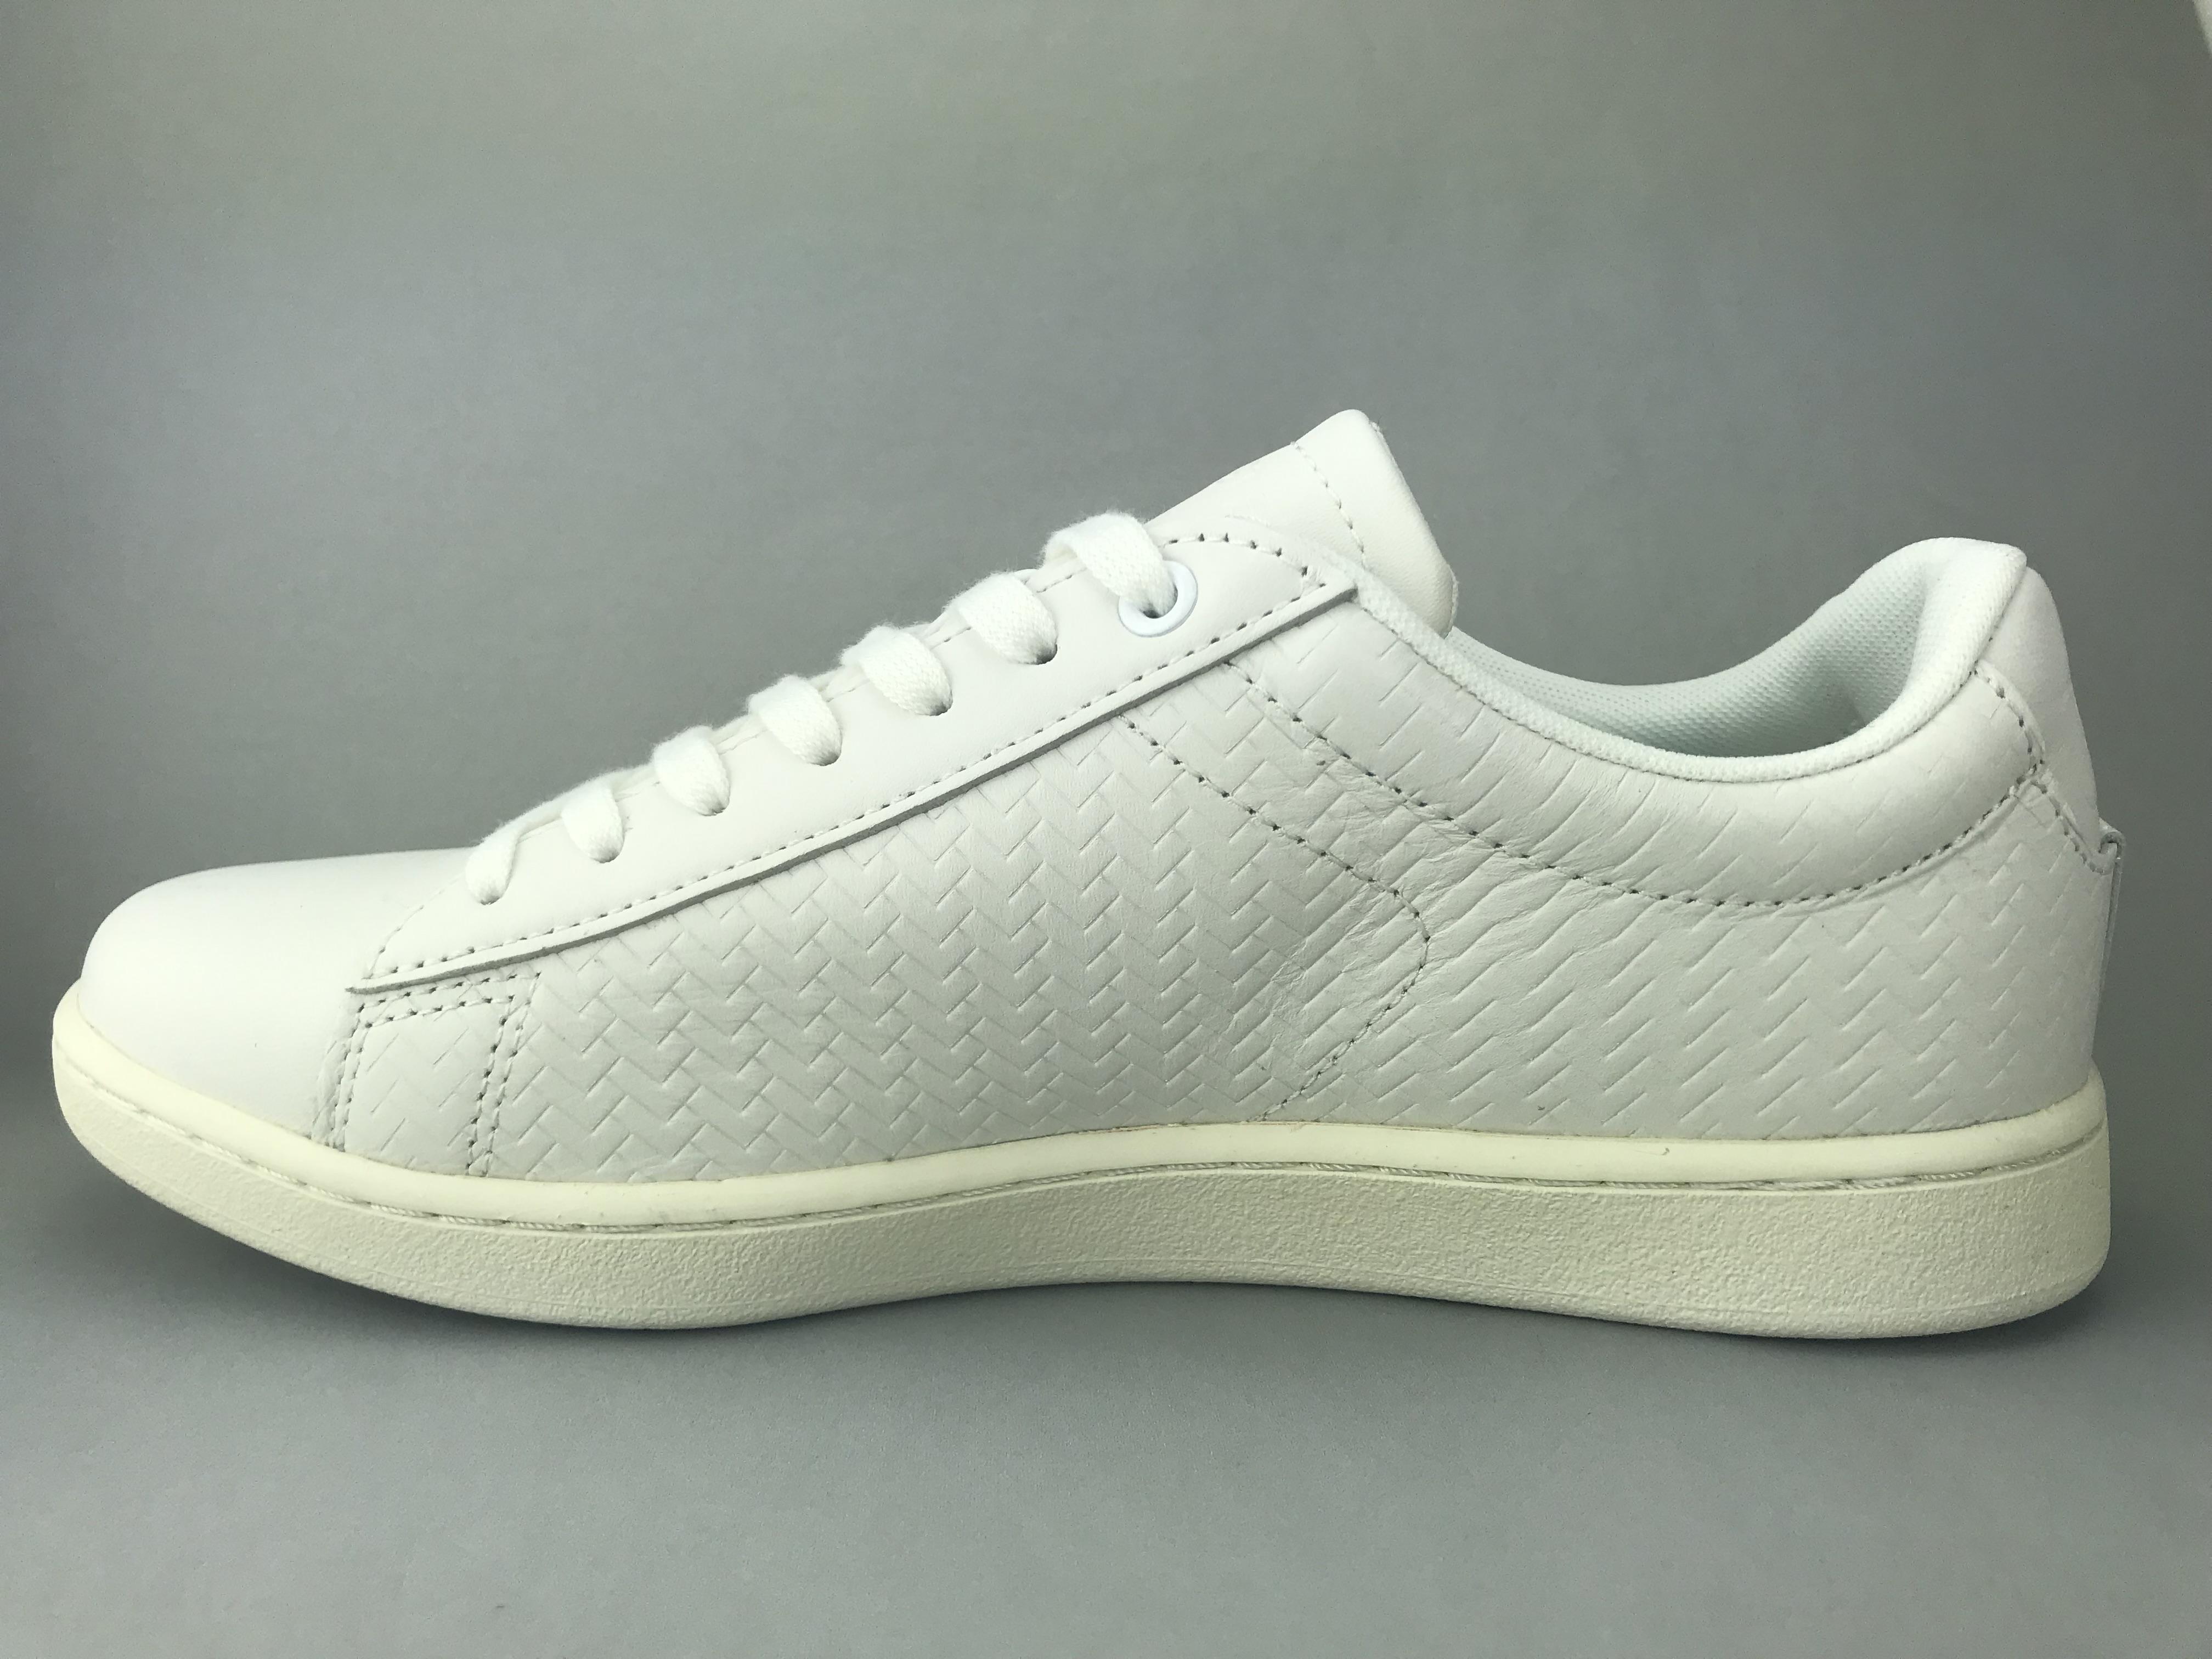 a9cc18463 Lacoste Hjoerring Sneakers Dame MGuld Krokodille R hvid Zjoos dk VpSUzqM